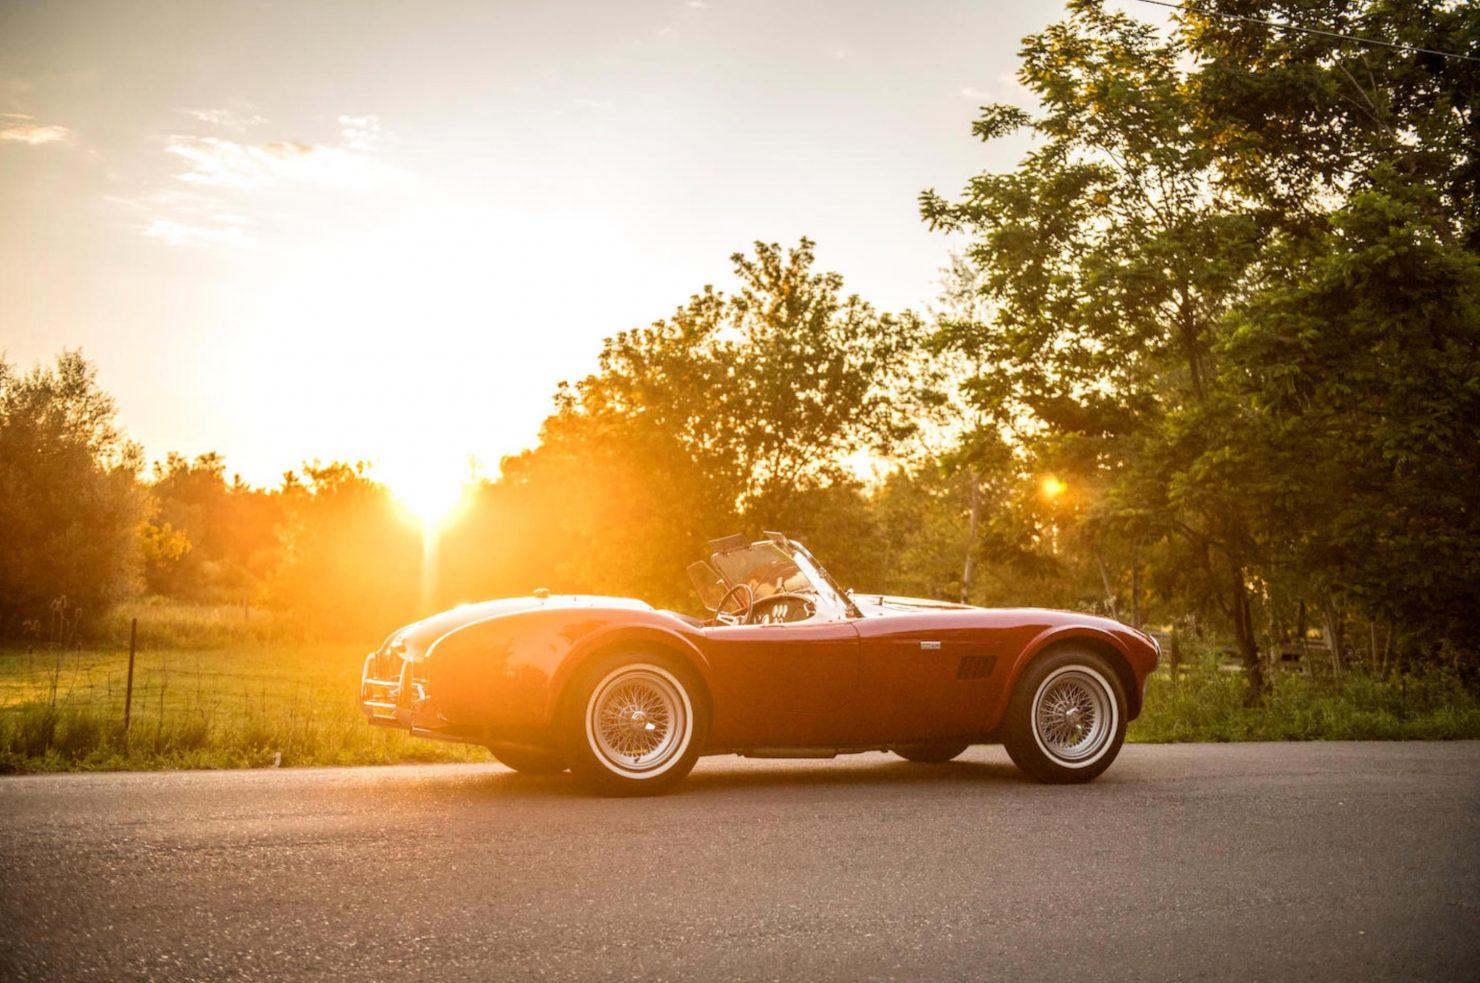 shelby ac cobra 289 37 1480x983 - 1964 Shelby AC Cobra 289